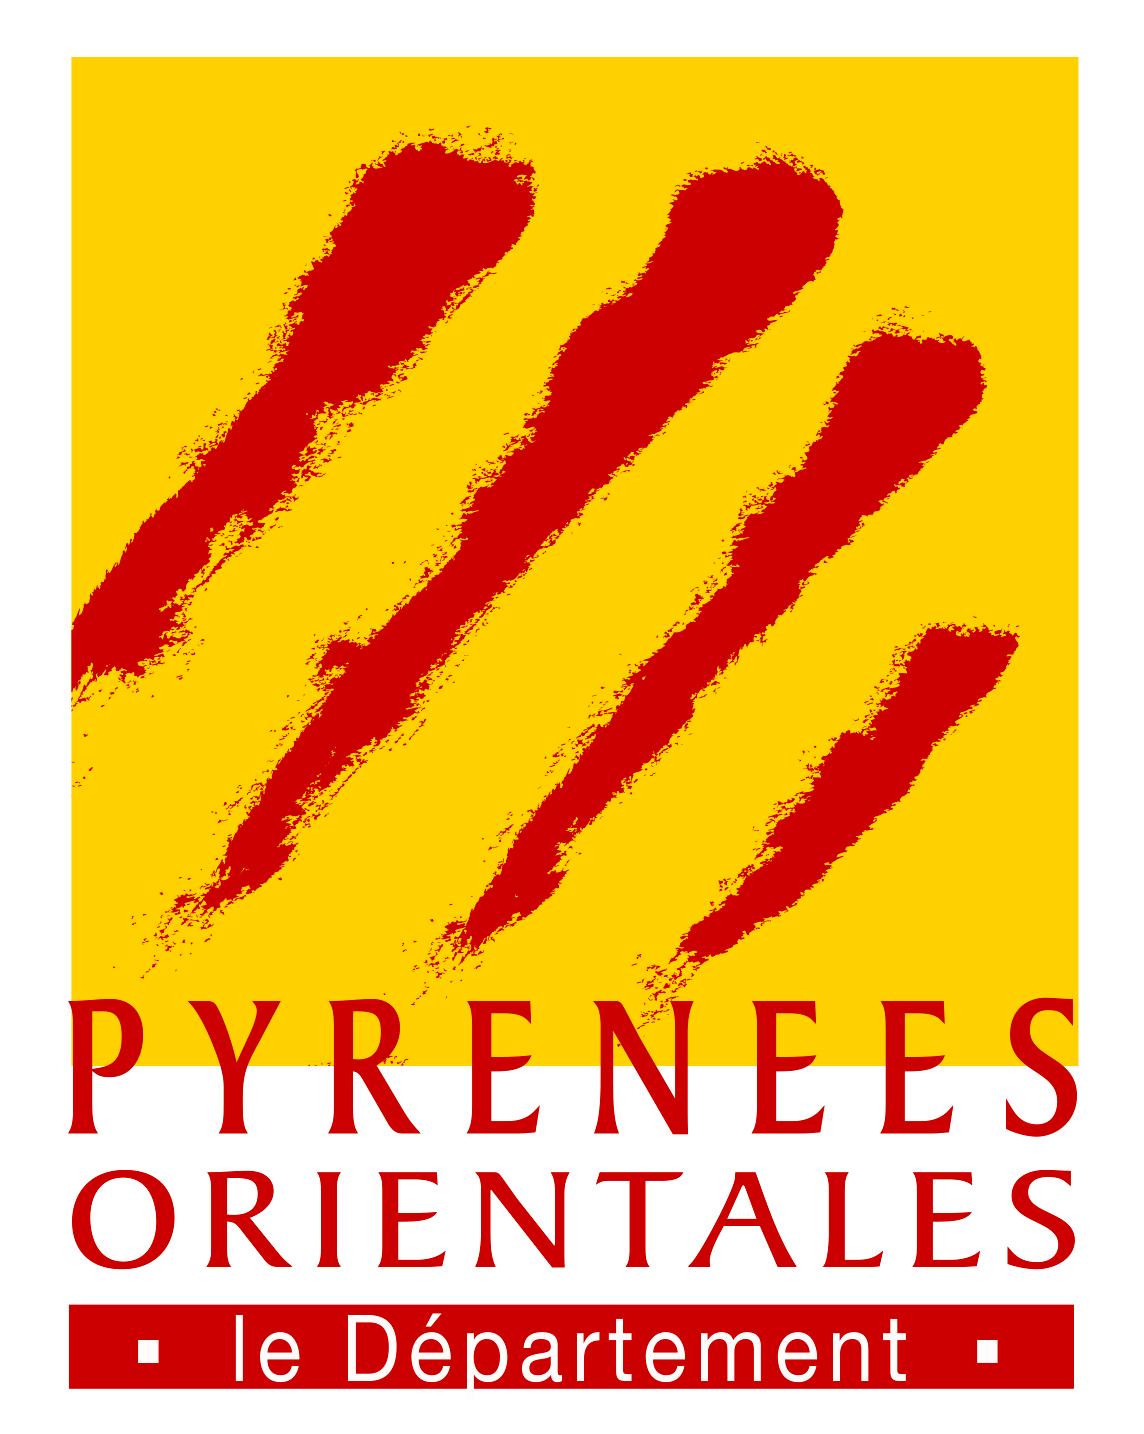 CONSEIL DEPARTEMENTAL DES PYRENEES ORIENTALES